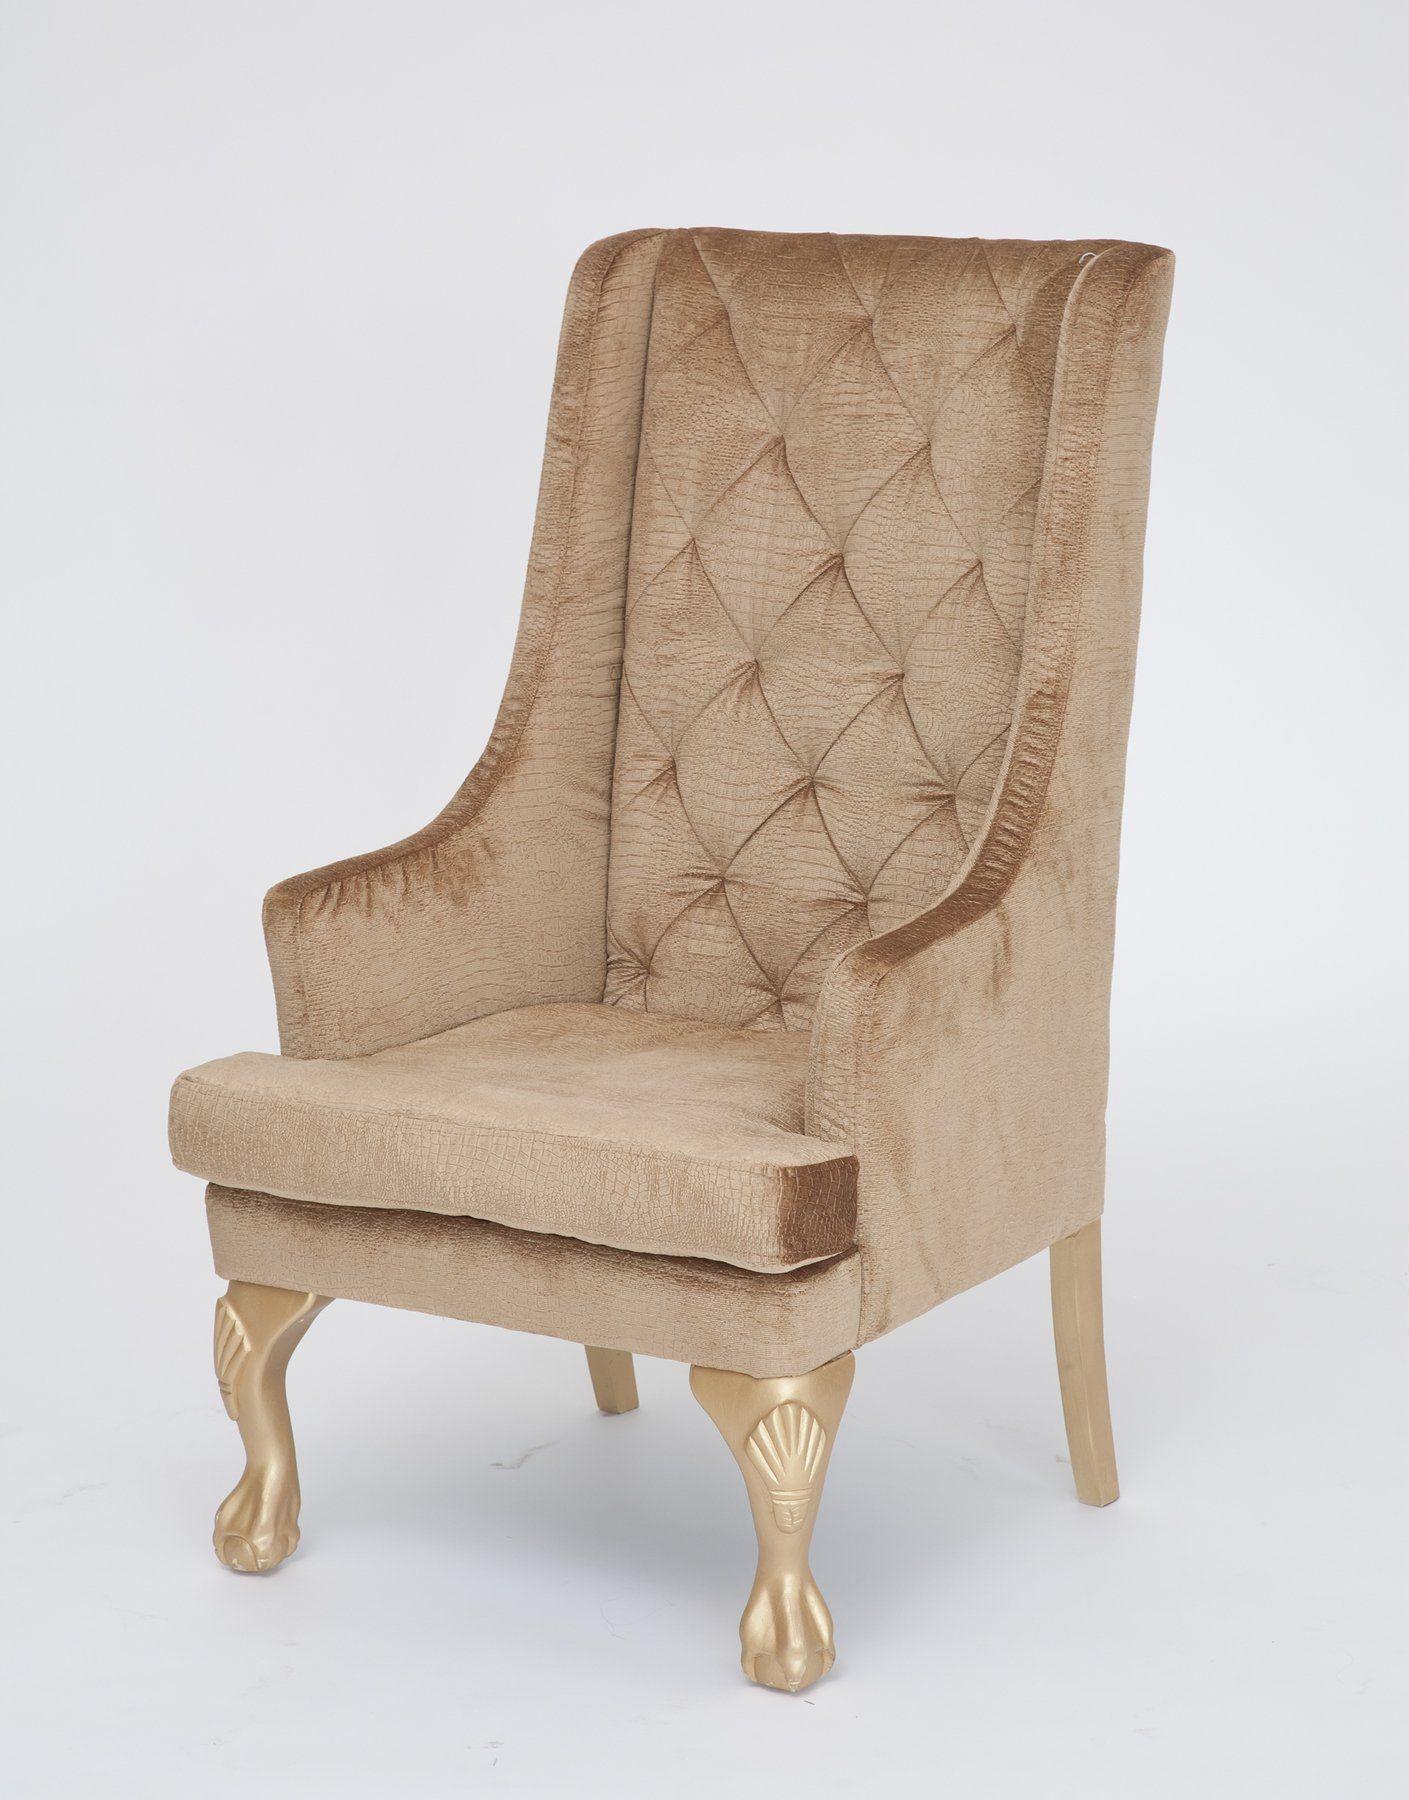 High Back Chair Storiestrending Com In 2020 High Sofas Chair Sofa Chair